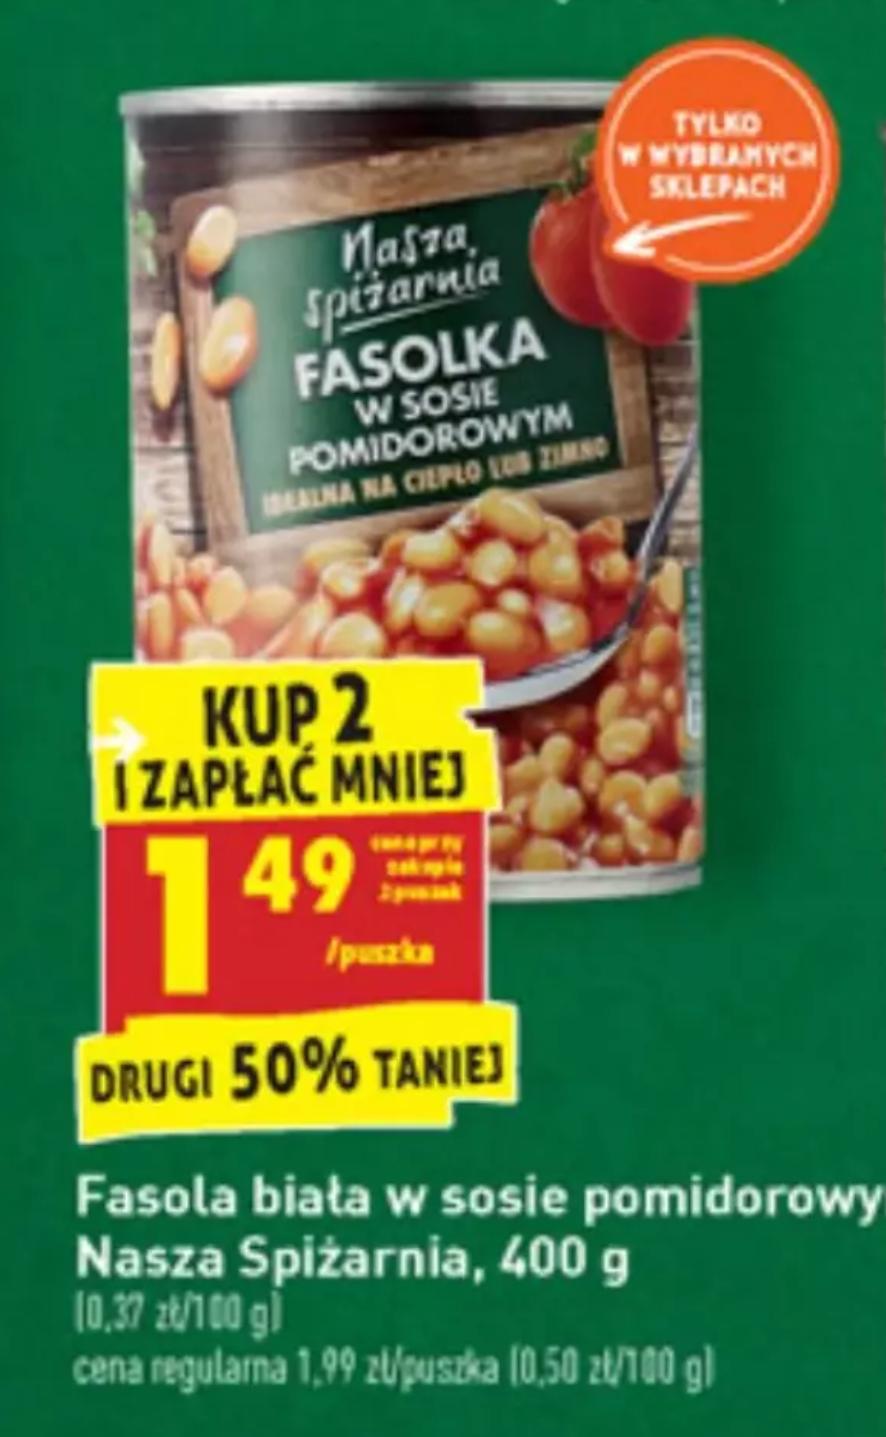 Fasolka w sosie pomidorowym 400g - Biedronka